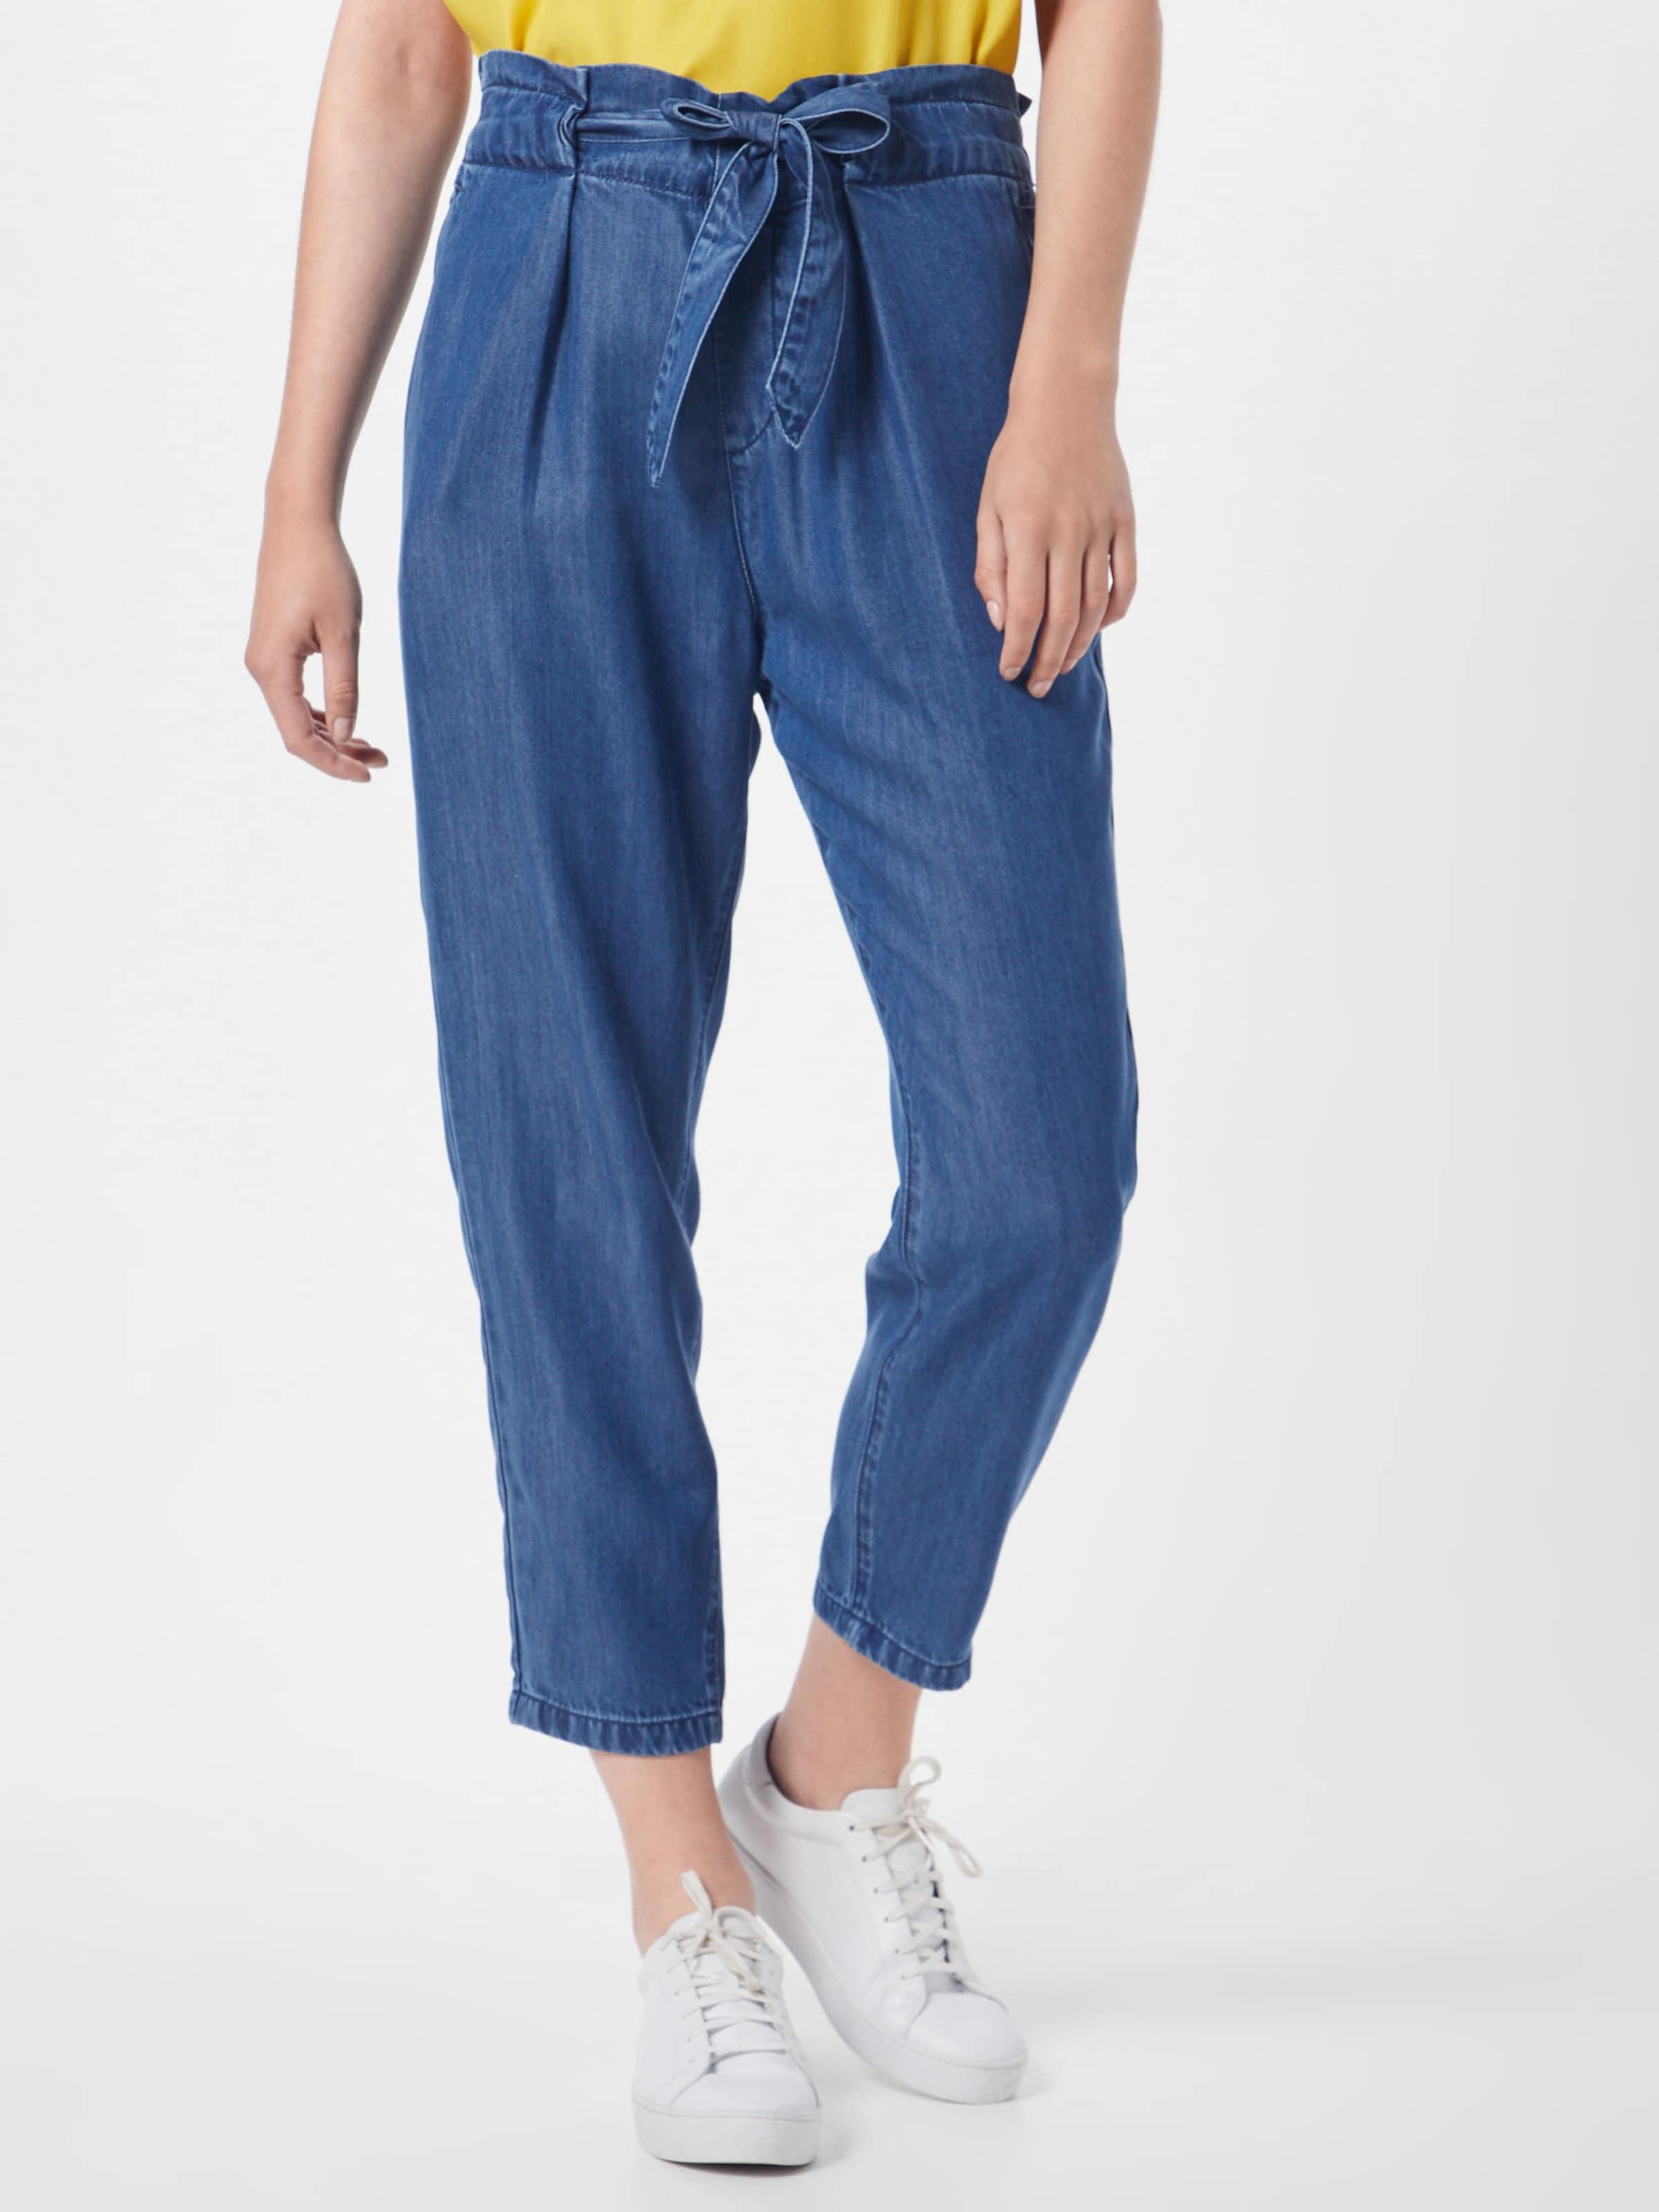 Blue Label Hose S oliver Jeansoptik Denim Red In qUSzpGMV